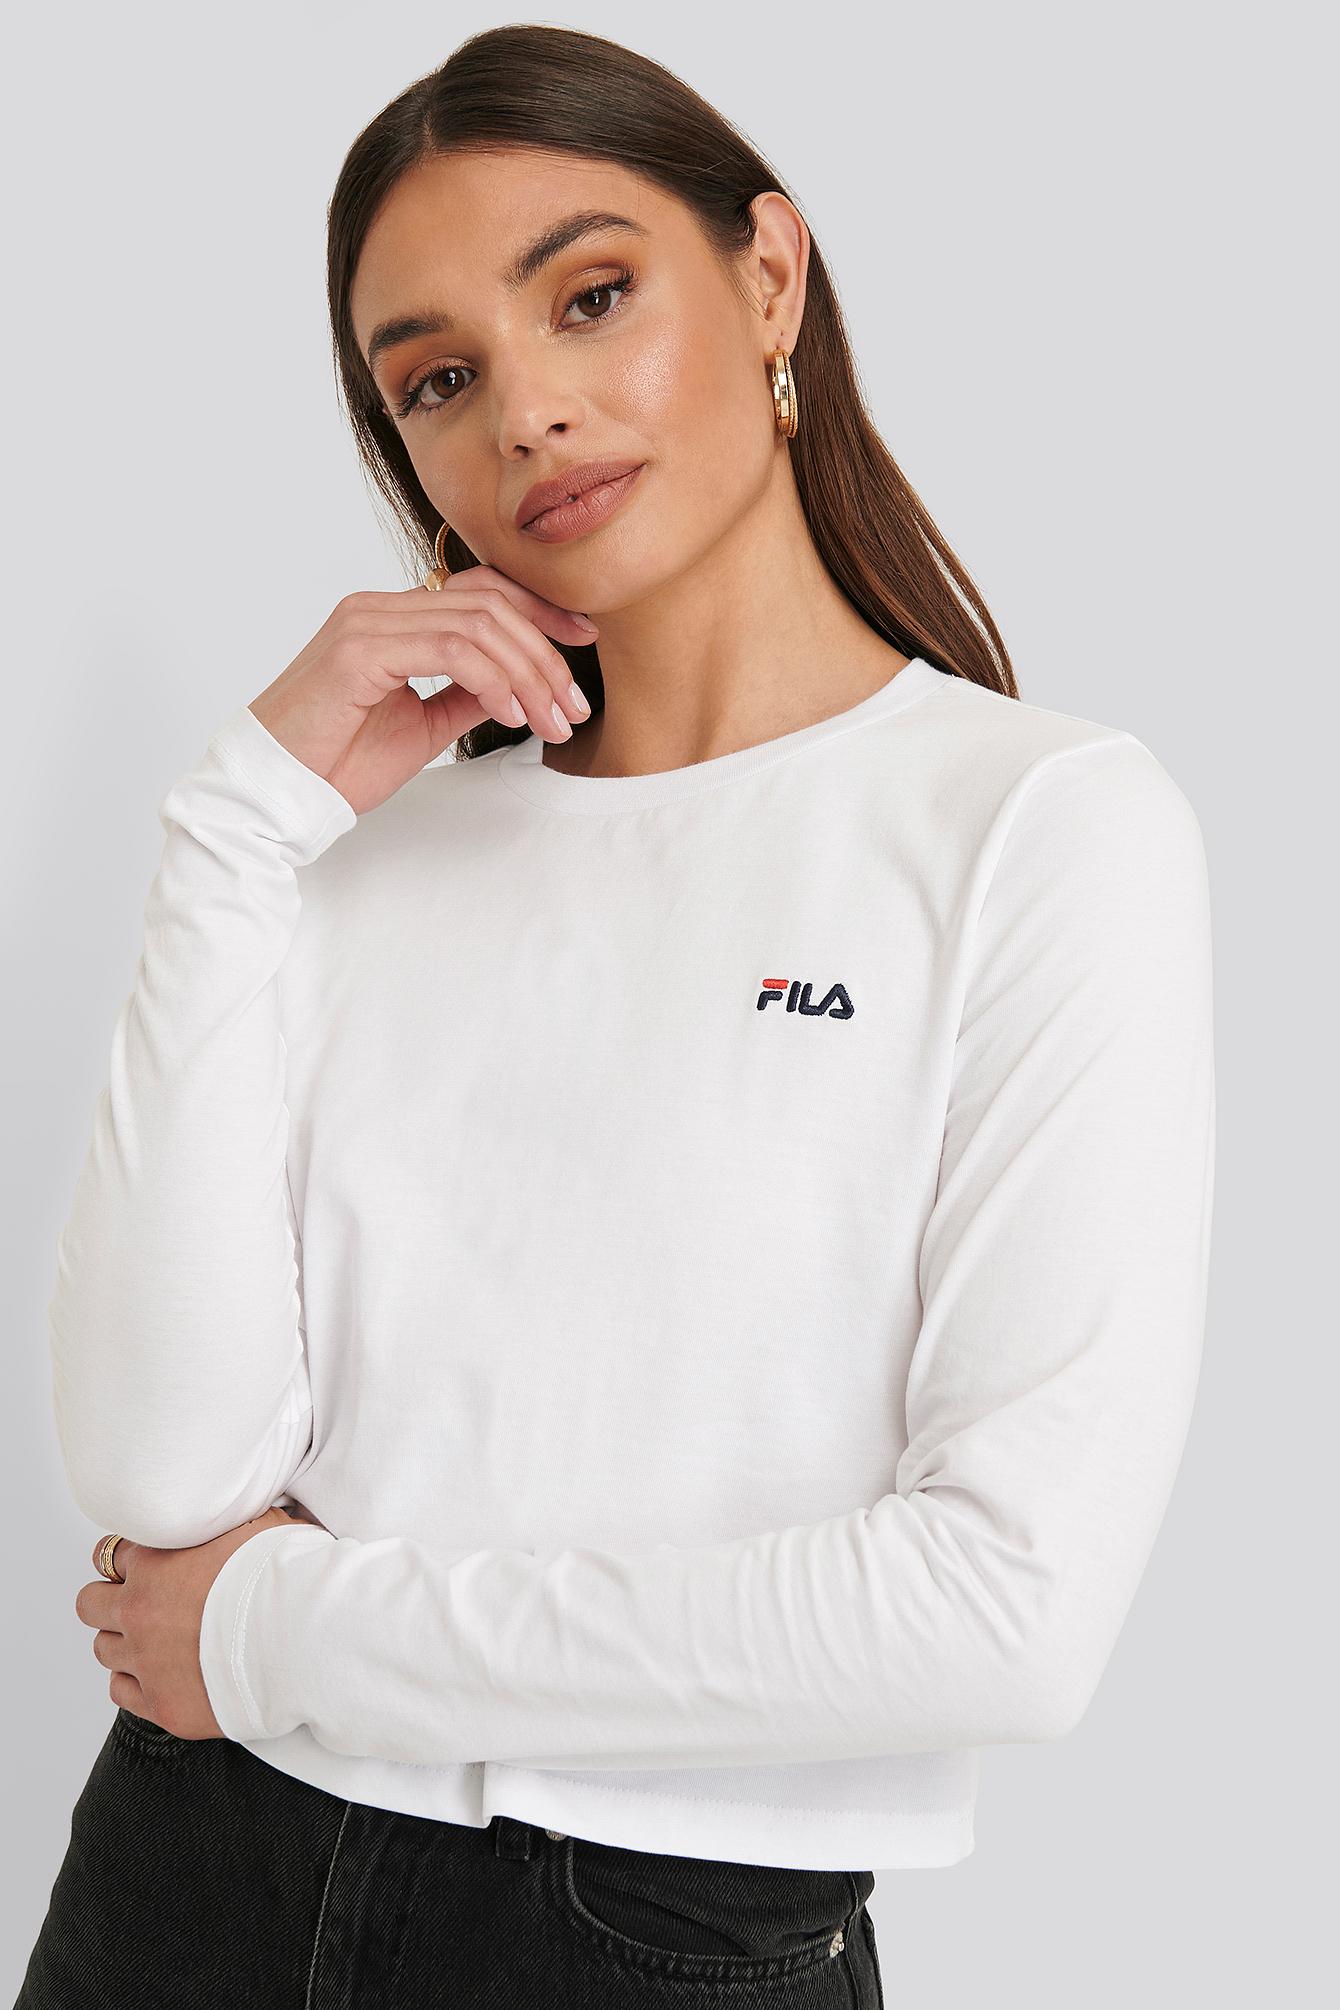 FILA Kurzes Hemd - White | Bekleidung > Blusen > Hemdblusen | Fila